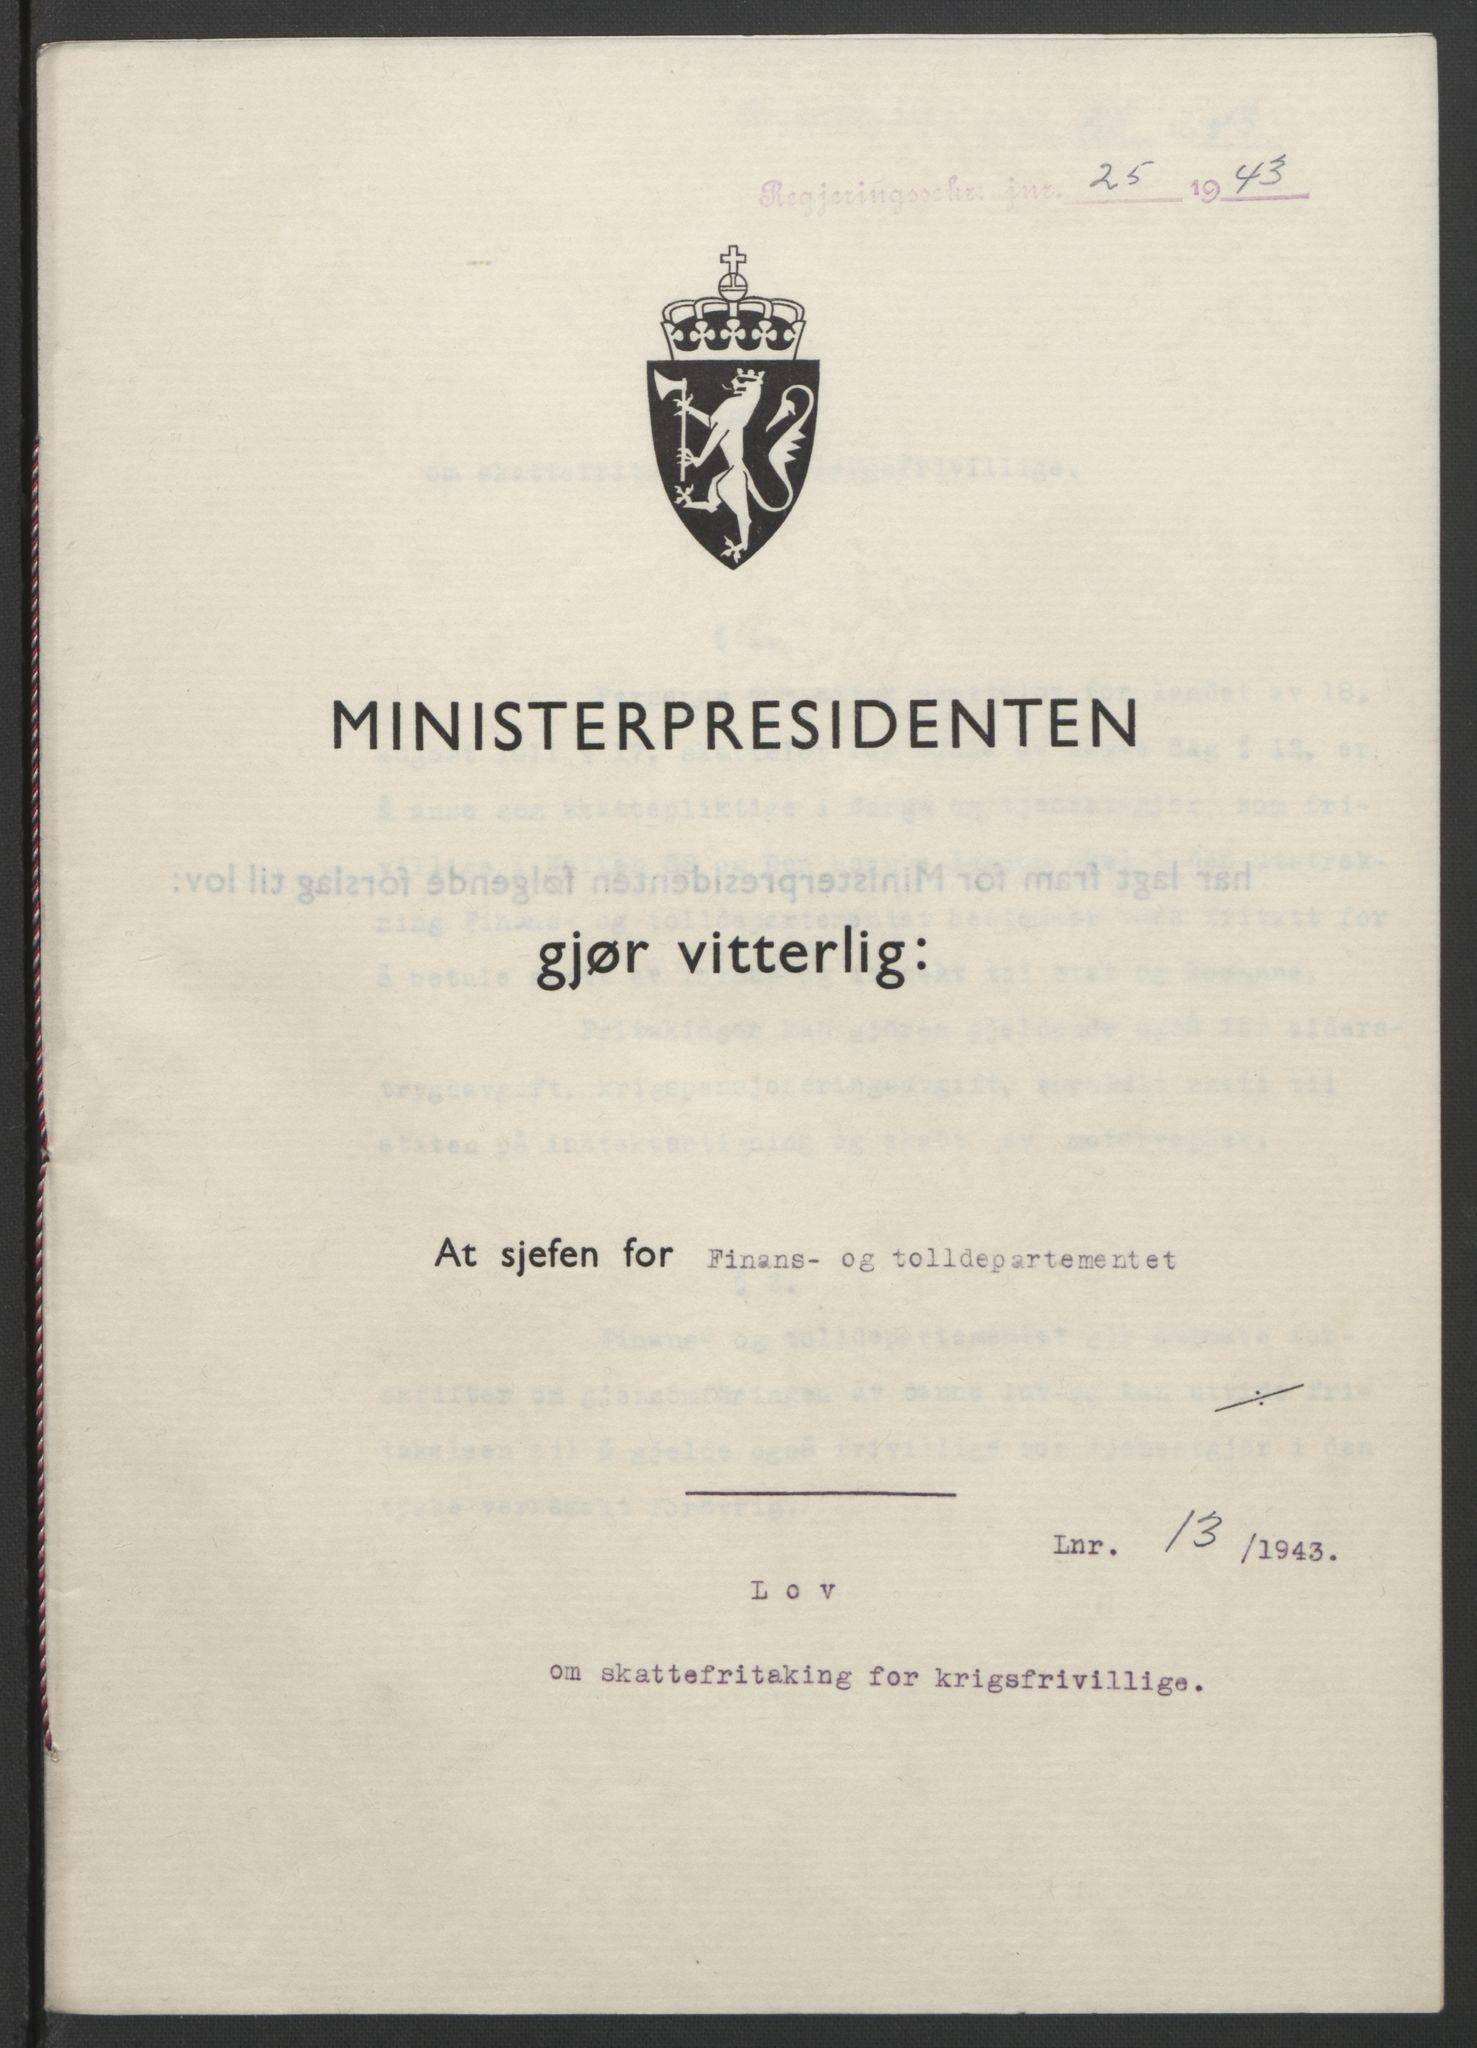 RA, NS-administrasjonen 1940-1945 (Statsrådsekretariatet, de kommisariske statsråder mm), D/Db/L0099: Lover, 1943, s. 52